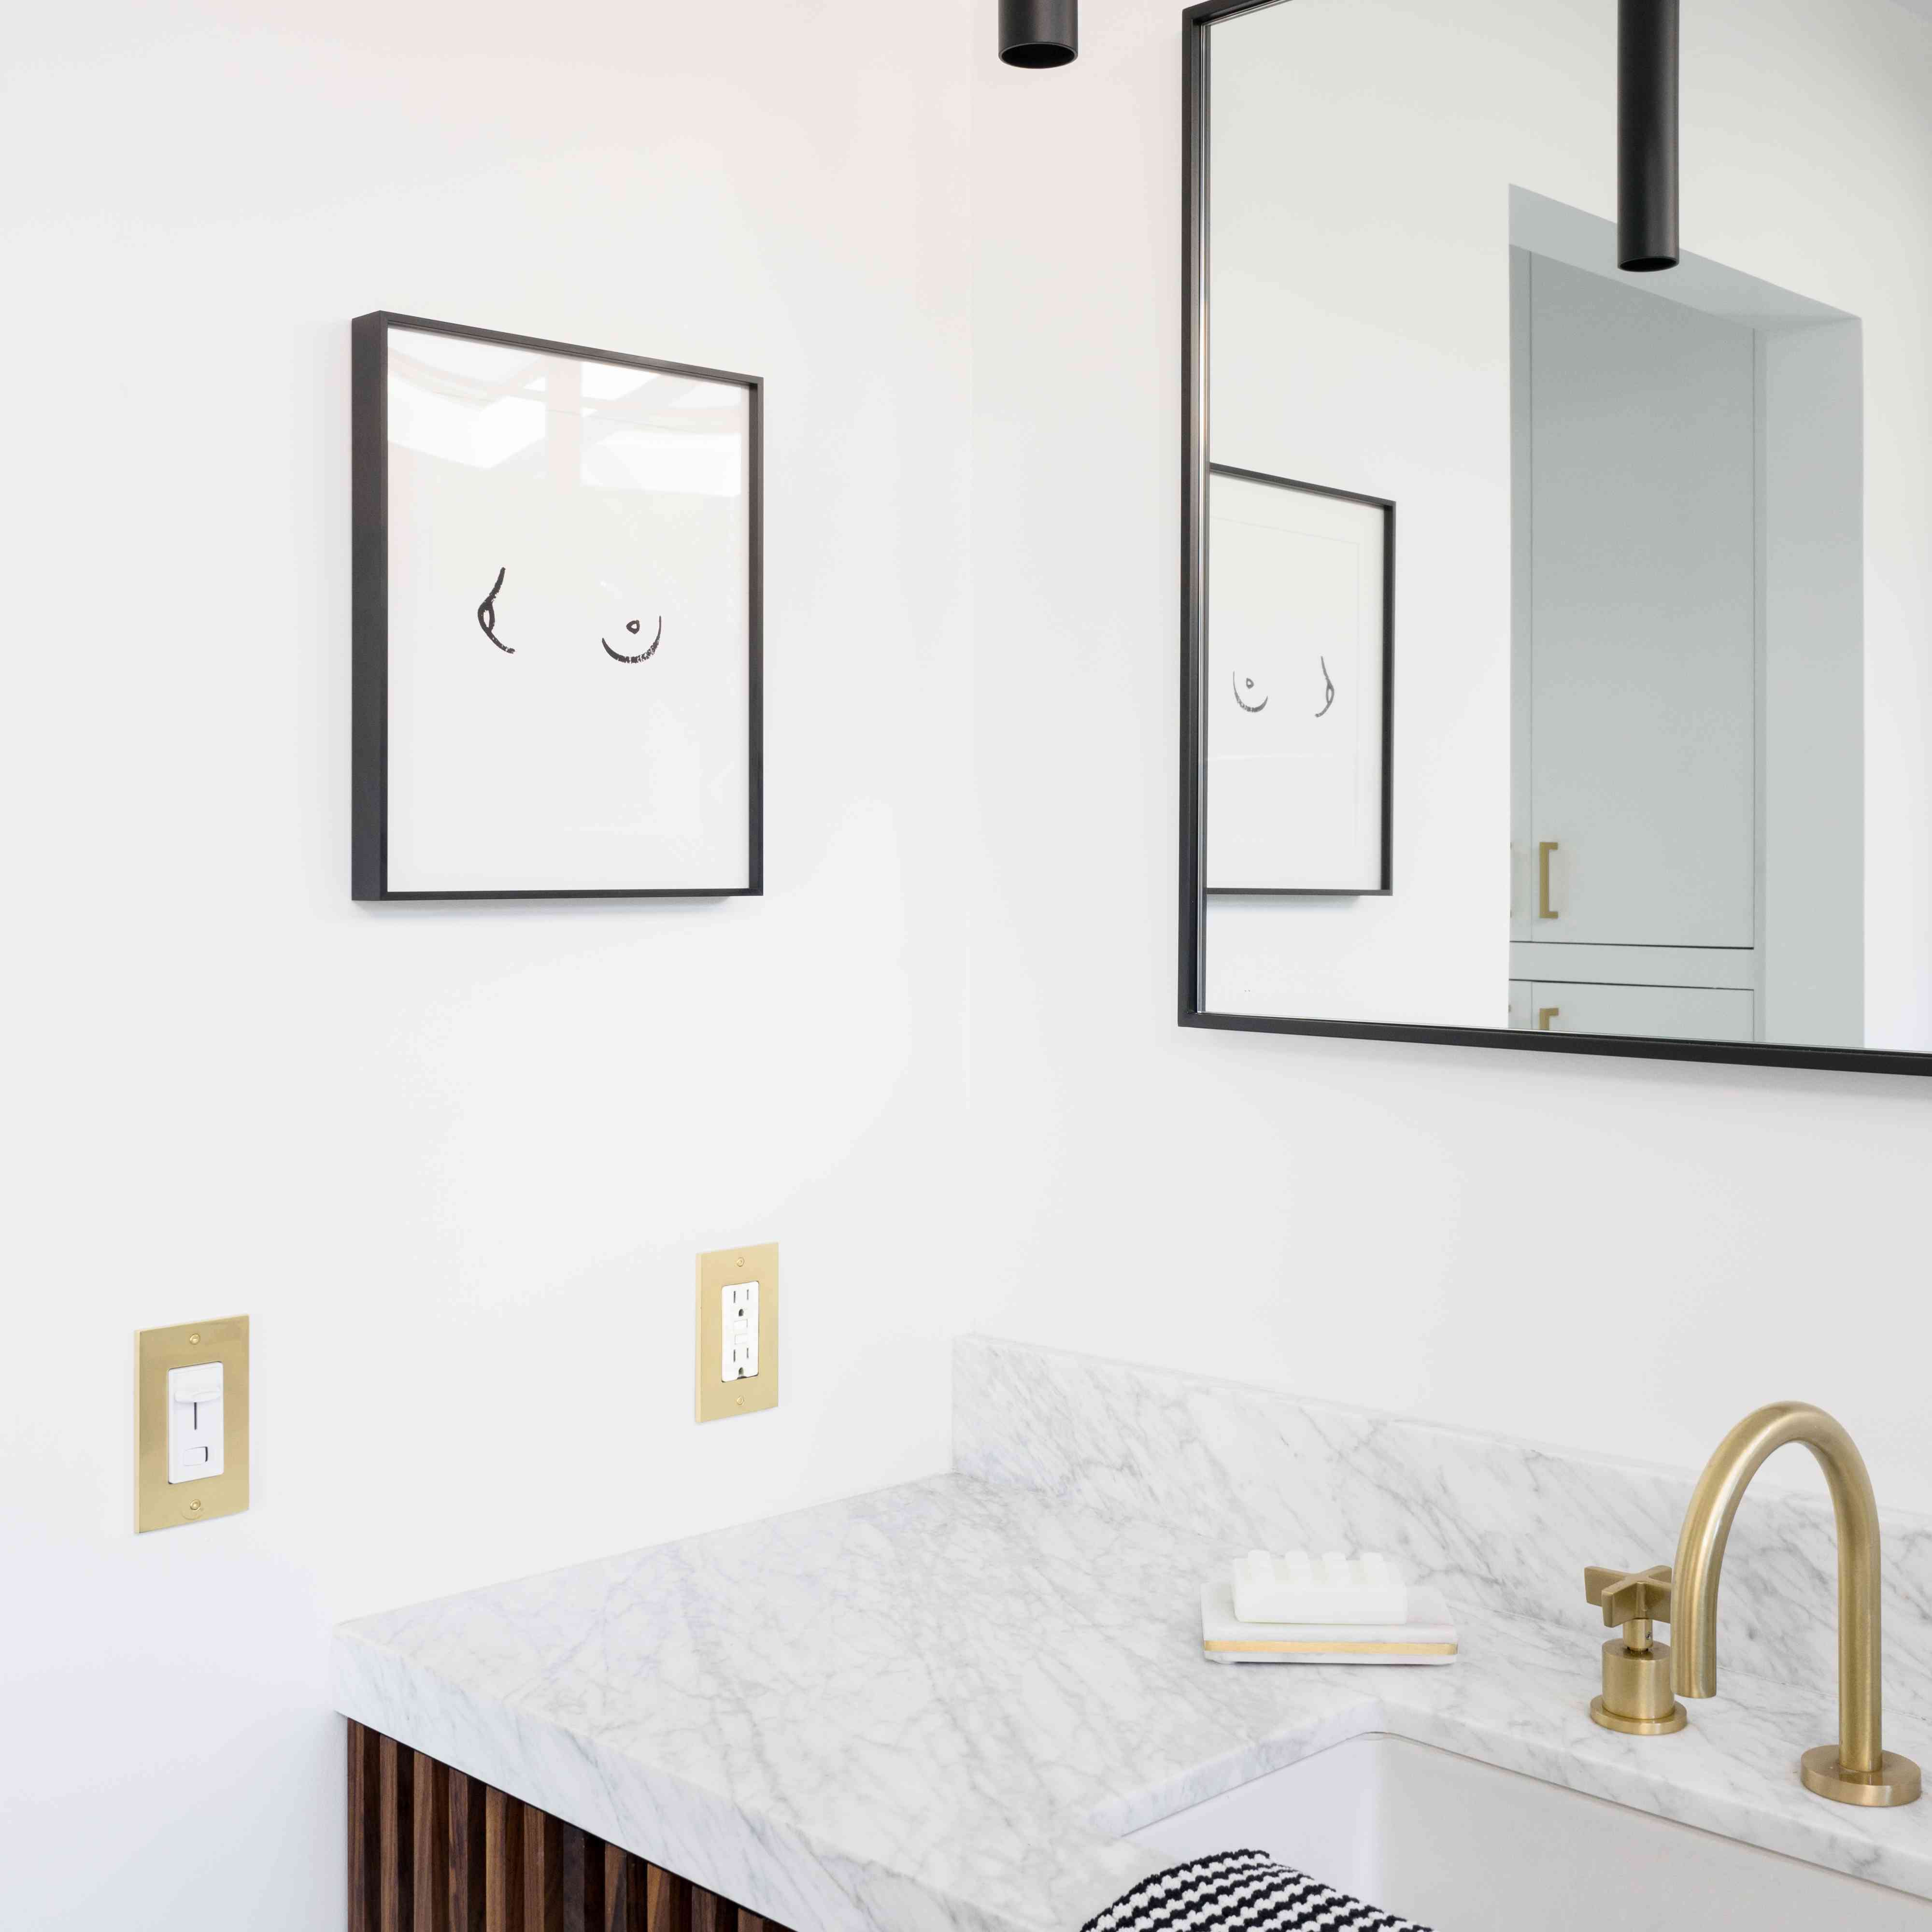 Bathroom vanity with marble countertop.